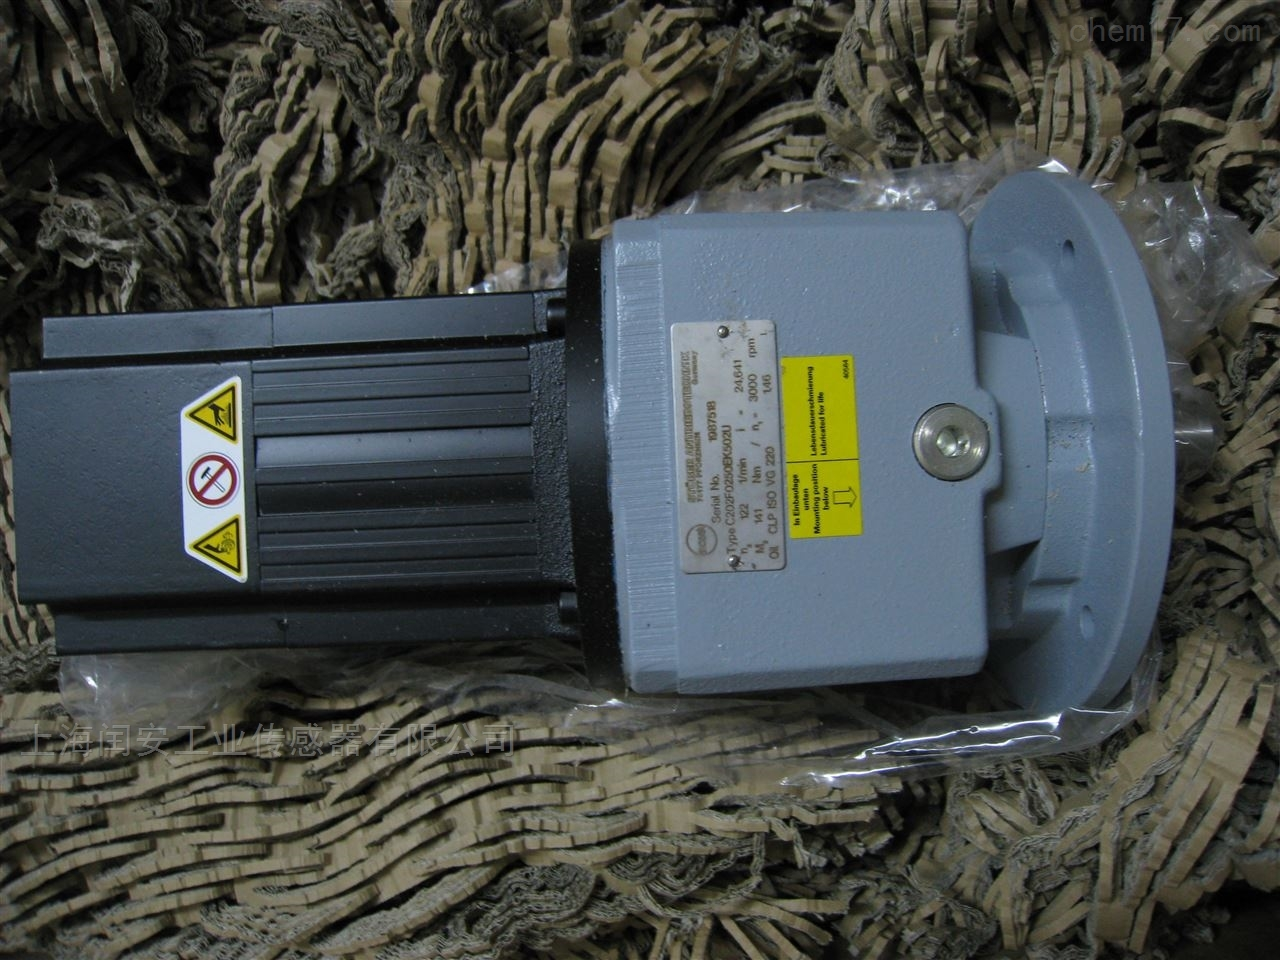 STOBER伺服电机行星齿轮减速箱驱动器